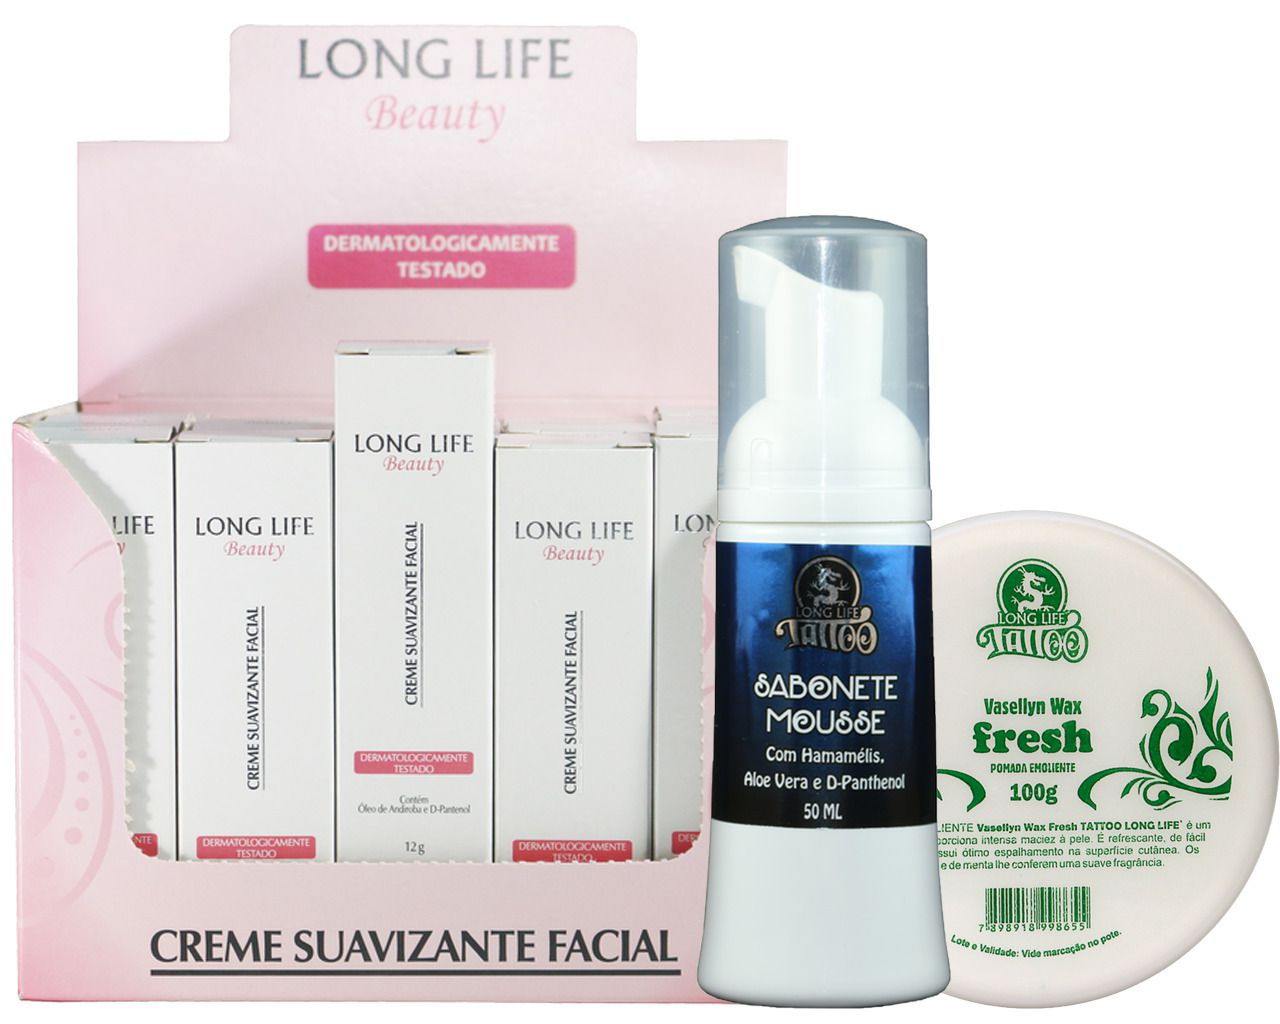 Creme Suavizante Facial Beauty 12g - Caixa com 20 unds + Sabonete Mousse 50 ml + Vasellyn Wax Fresh 100g